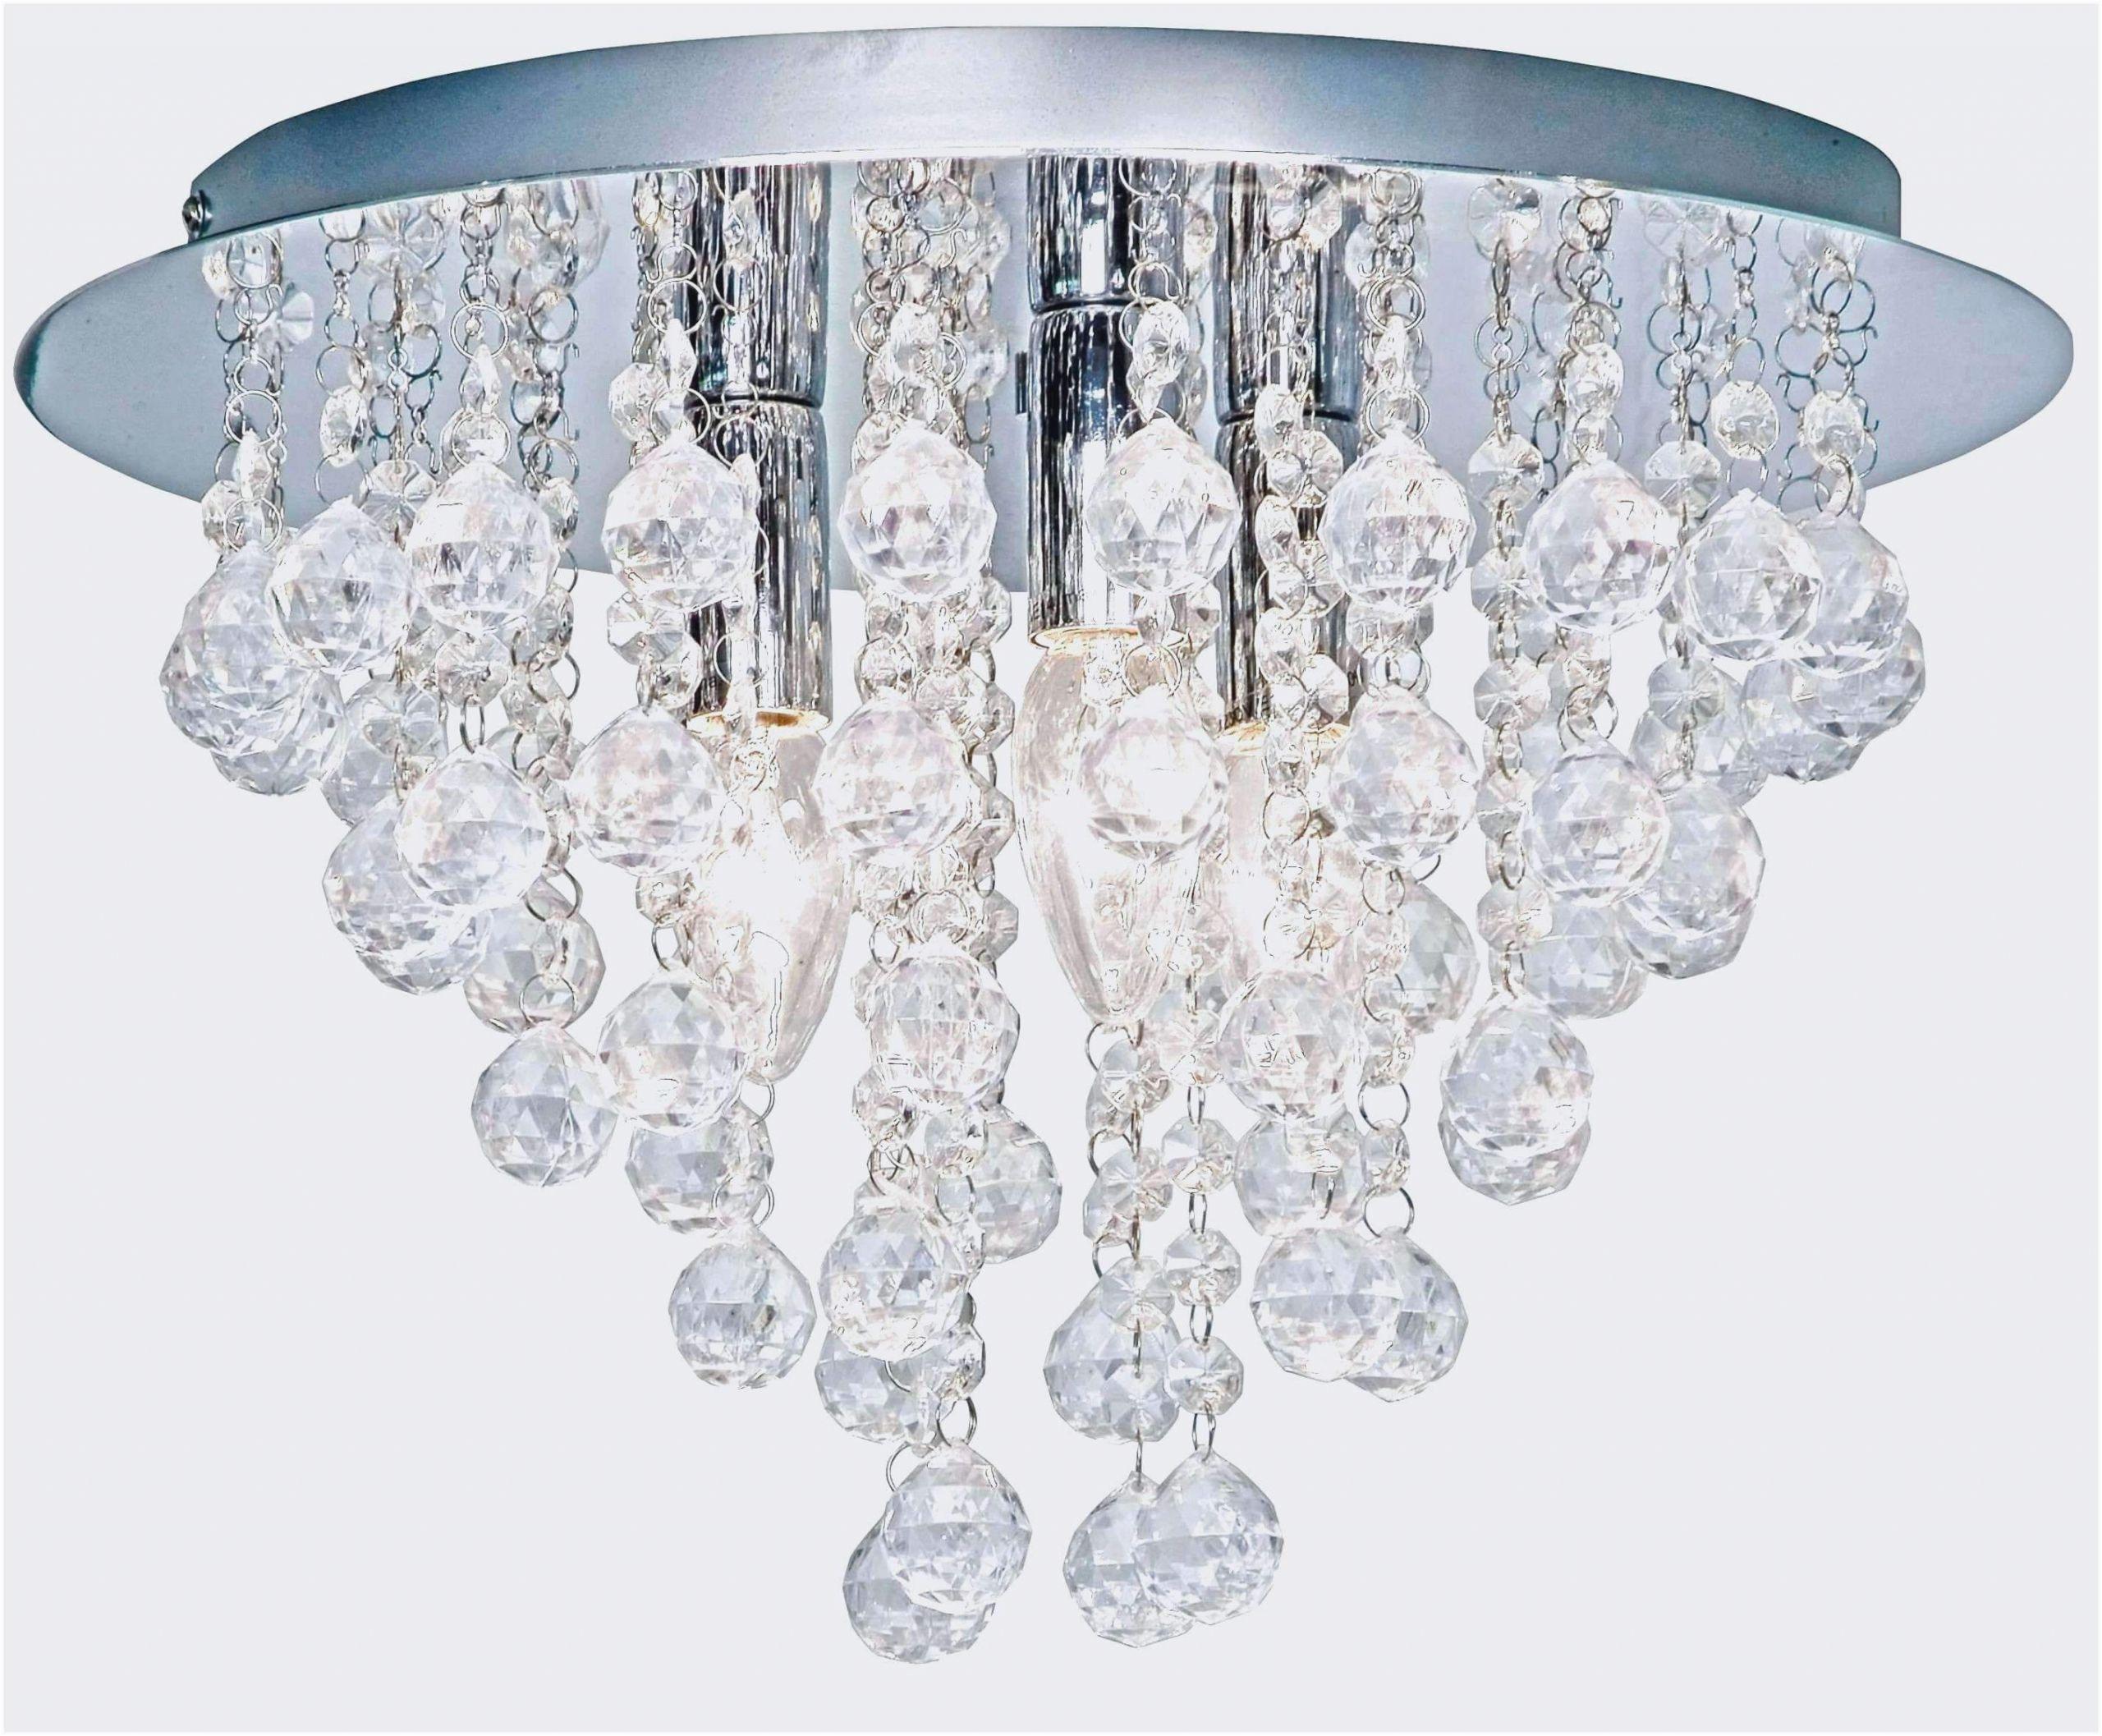 ikea lampen wohnzimmer luxus luxe led lampe badezimmer bestevon wohnzimmer licht 0d of ikea lampen wohnzimmer scaled